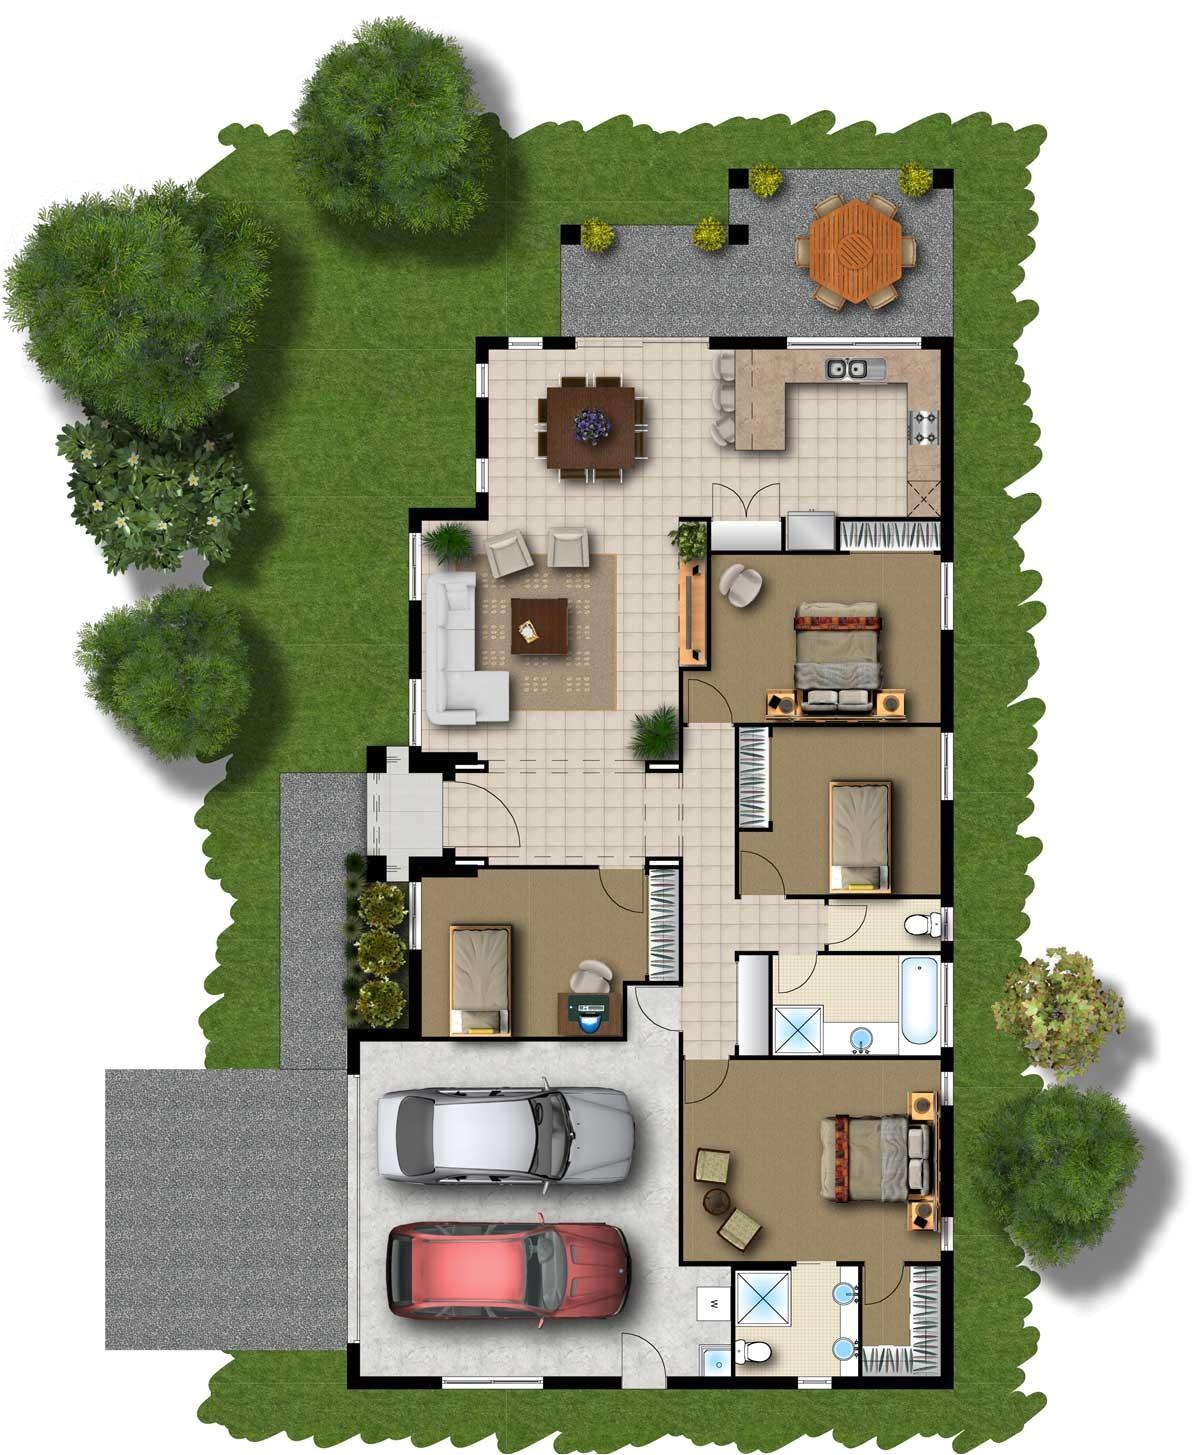 daec8bd229f23848 4 bedroom house floor plans 3d house floor plans